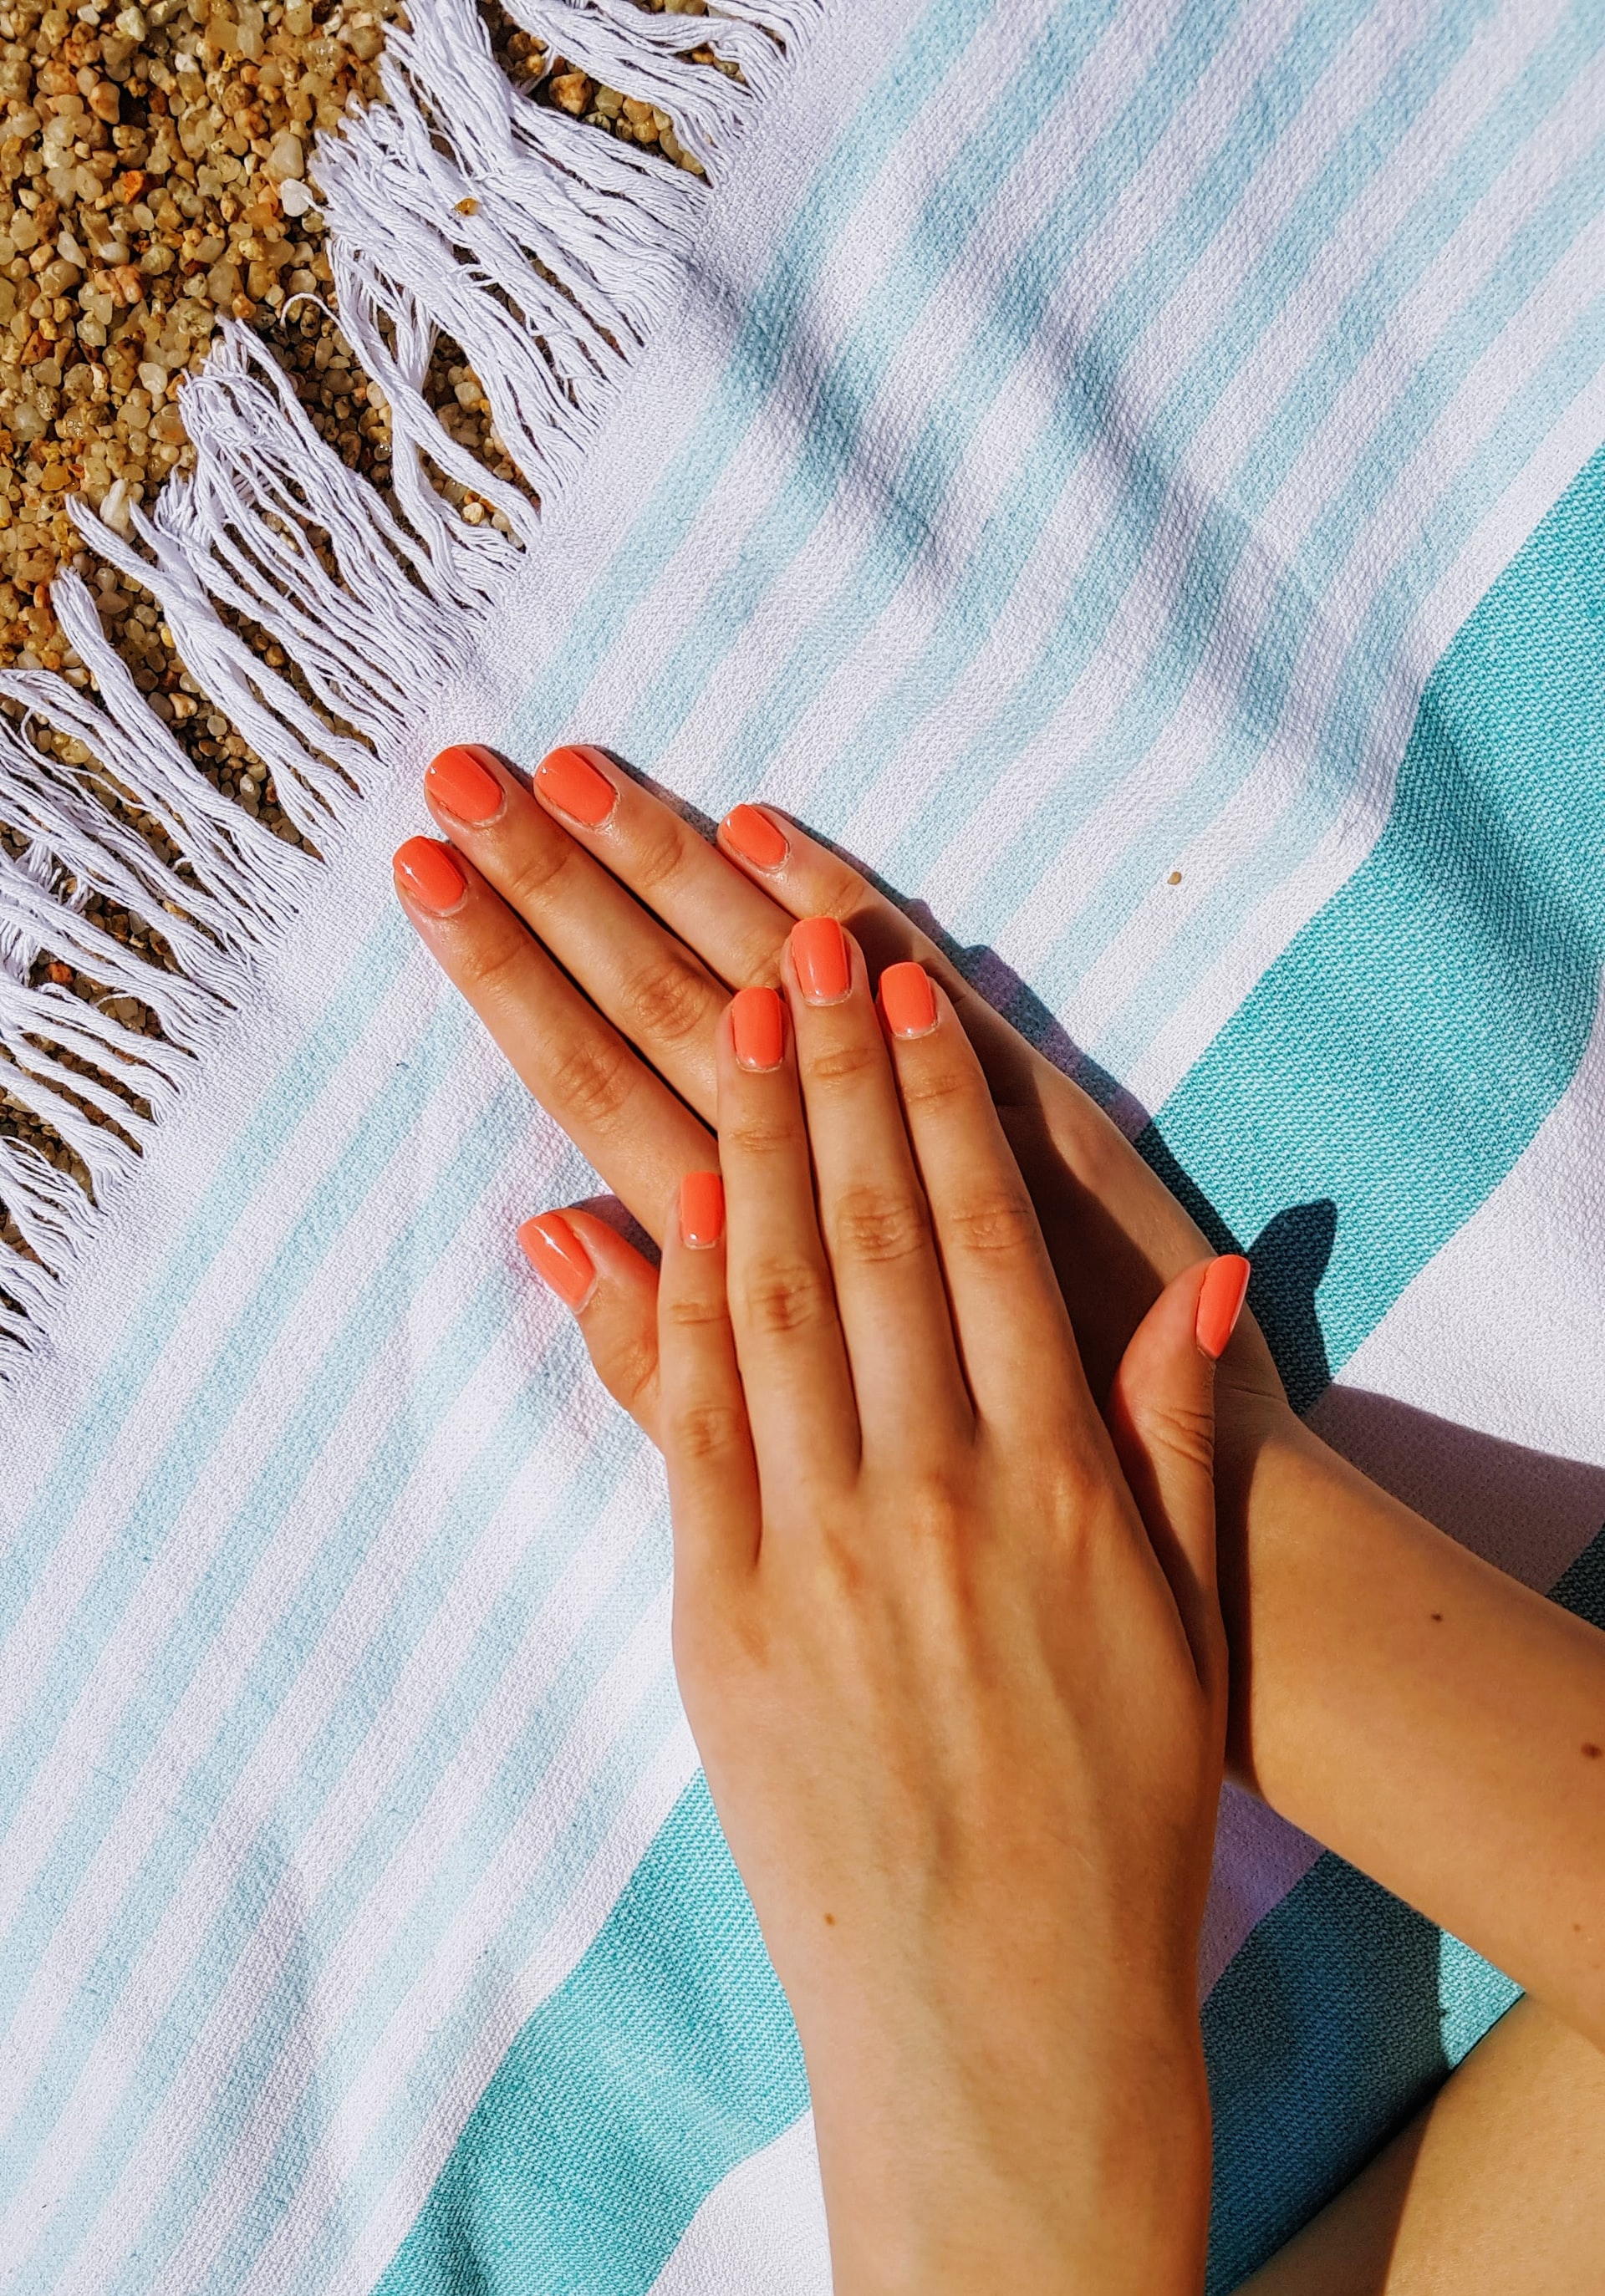 Koopr-mains-ongles-vernis-LazarGugleta-Unsplash